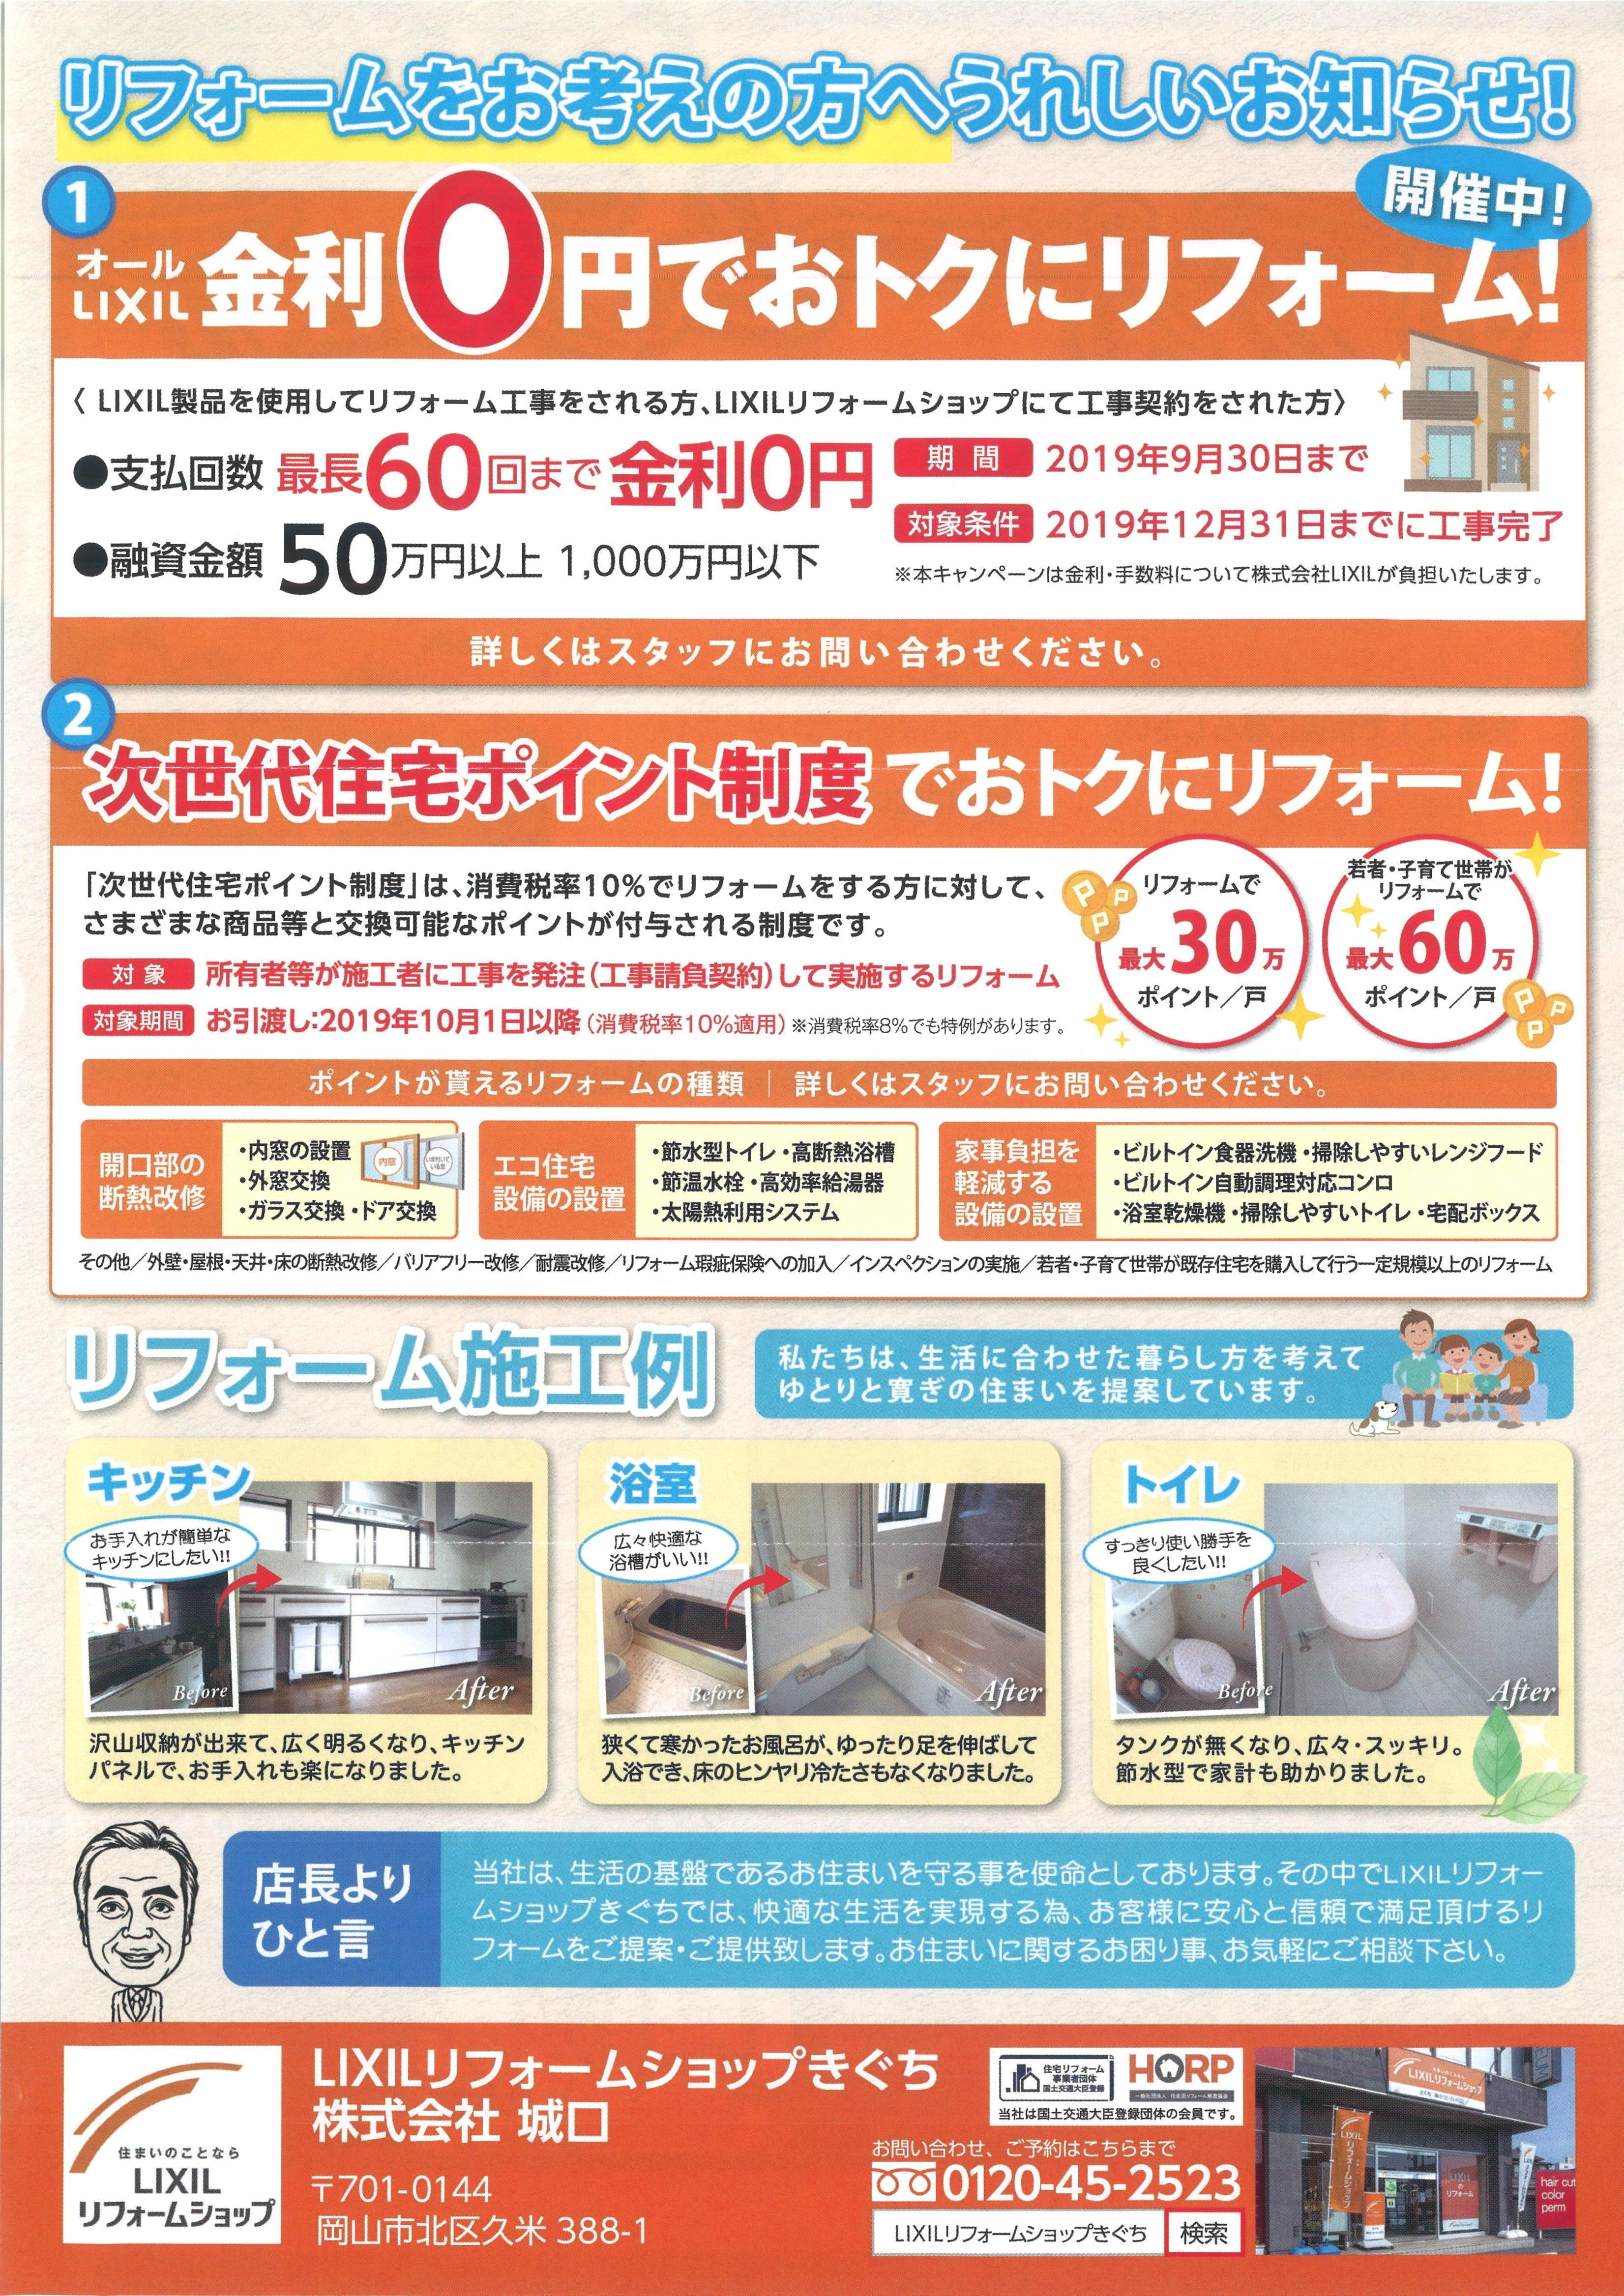 https://lixil-reformshop.jp/shop/SP00000598/photos/1c81adeafe558cb678163411e607dbba9b934f9b.jpg